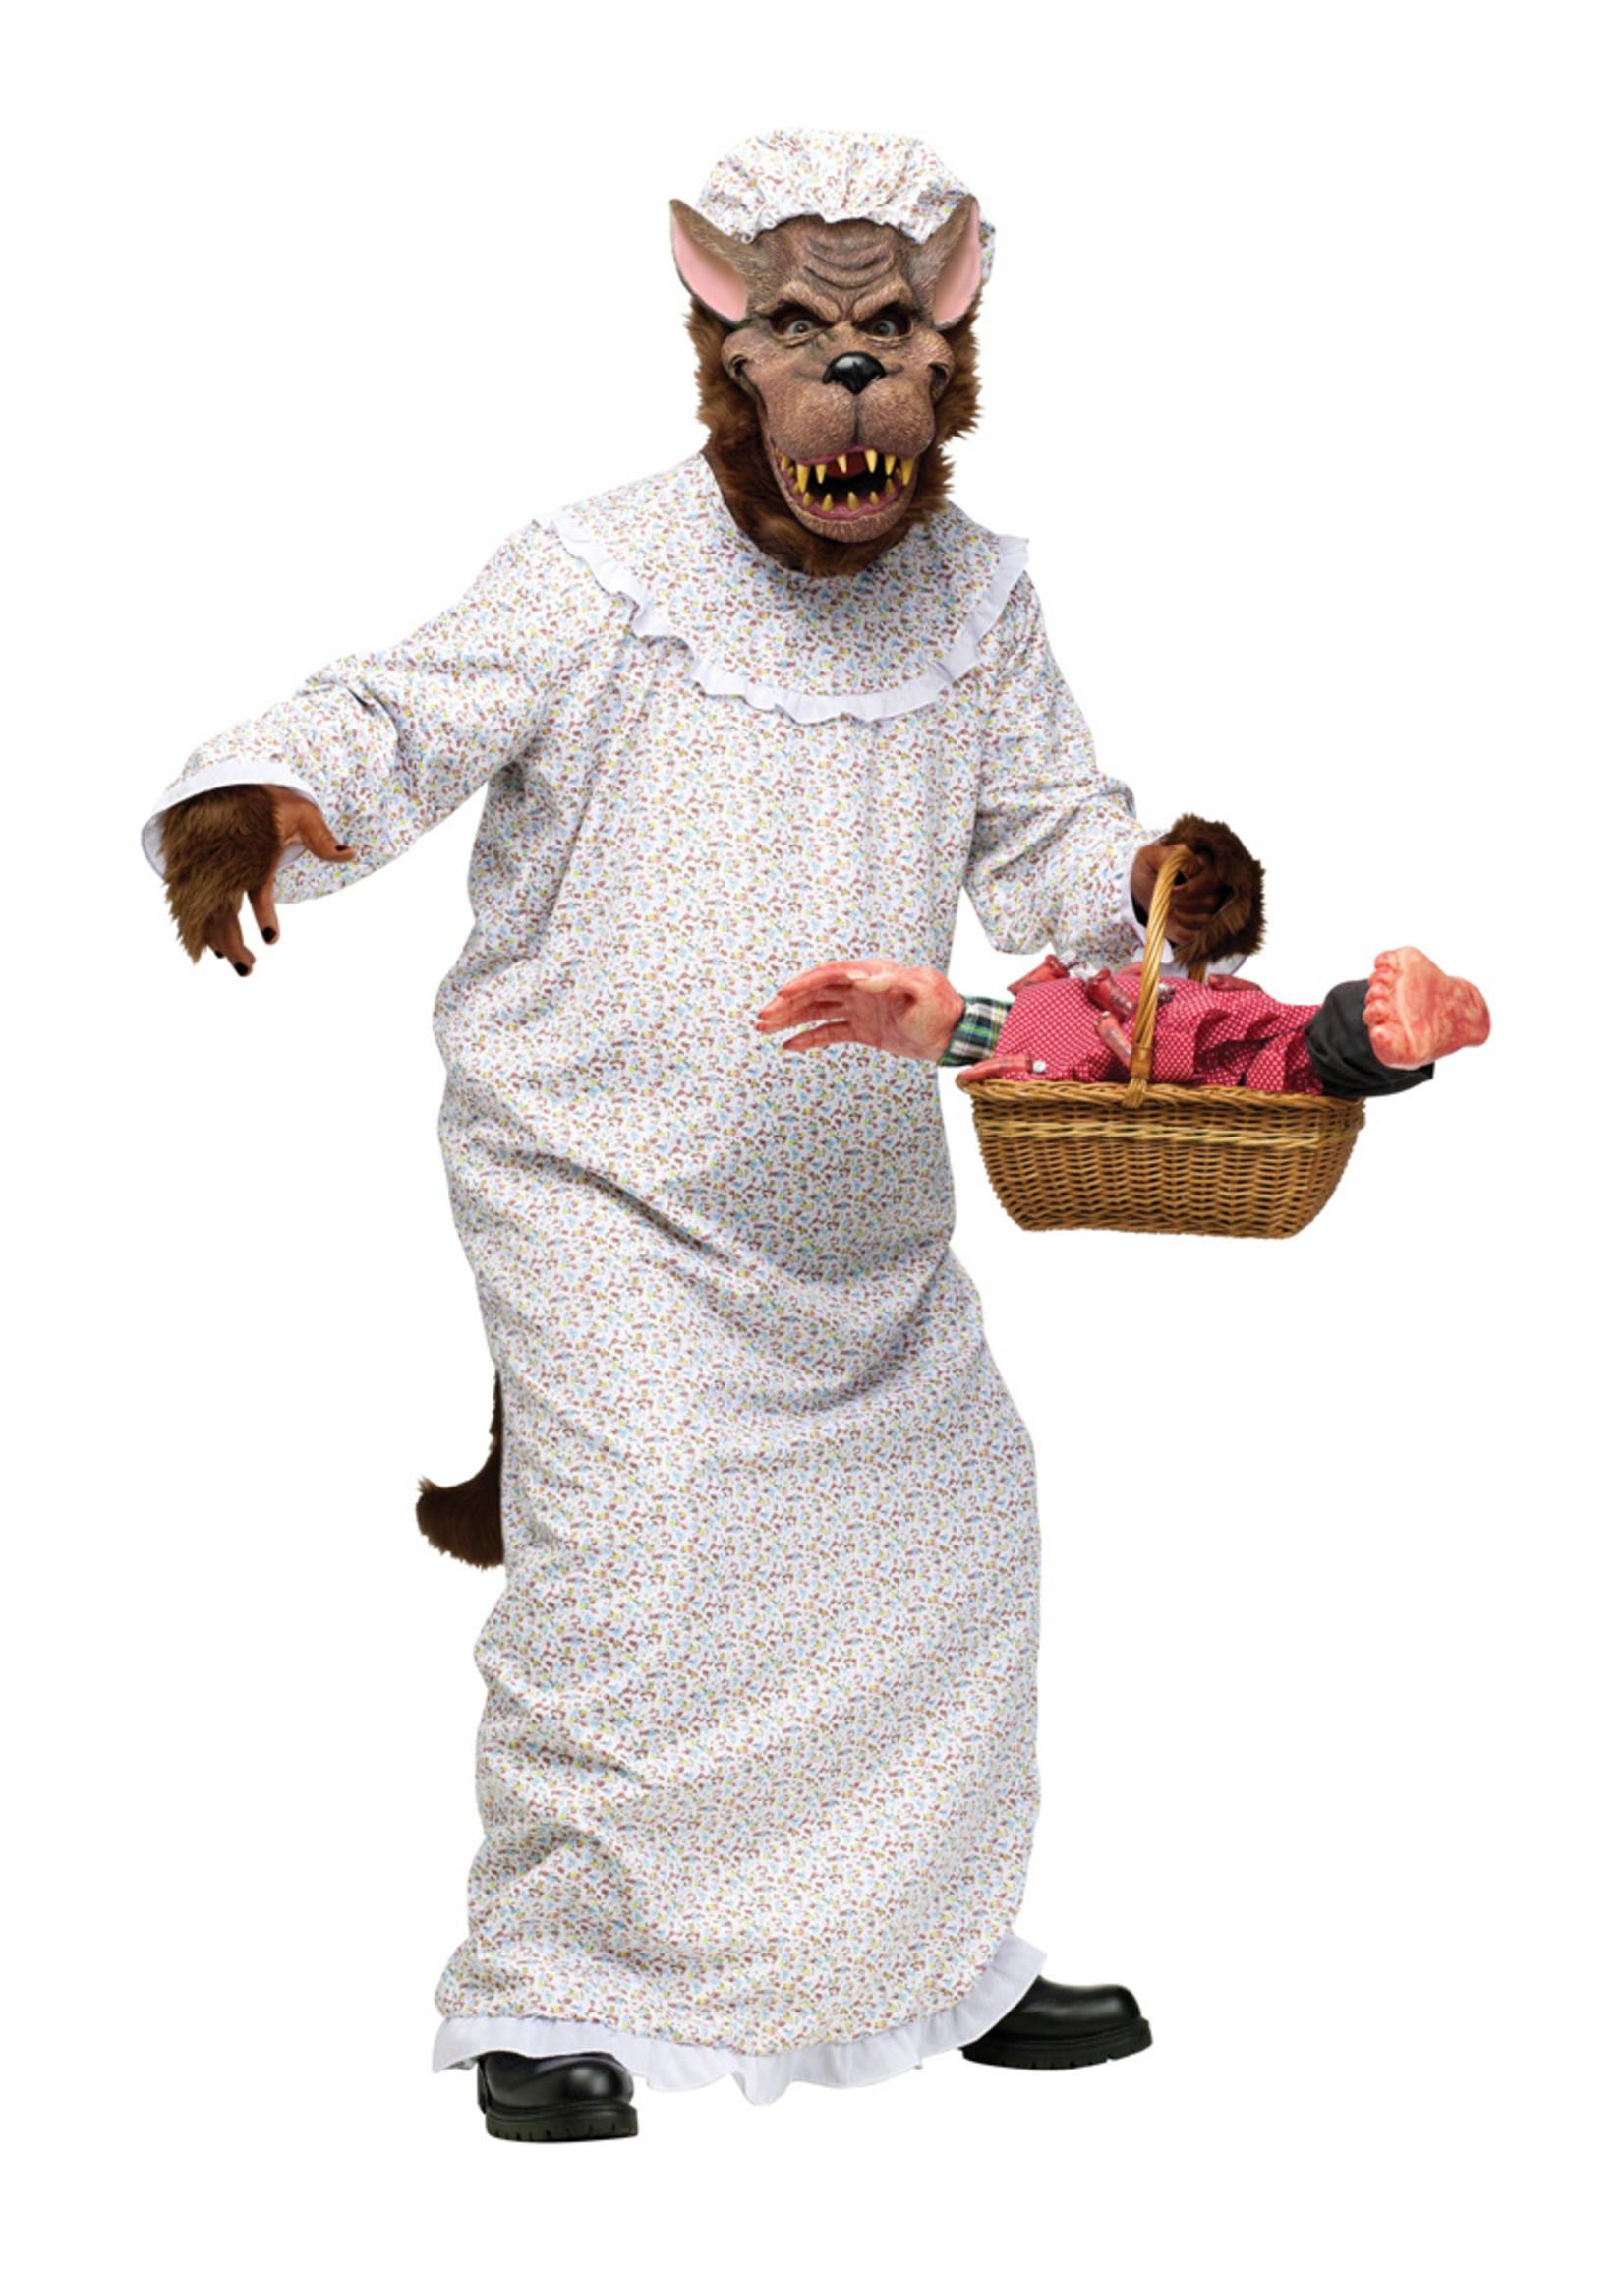 Big Bad Granny Wolf Costume - Humor